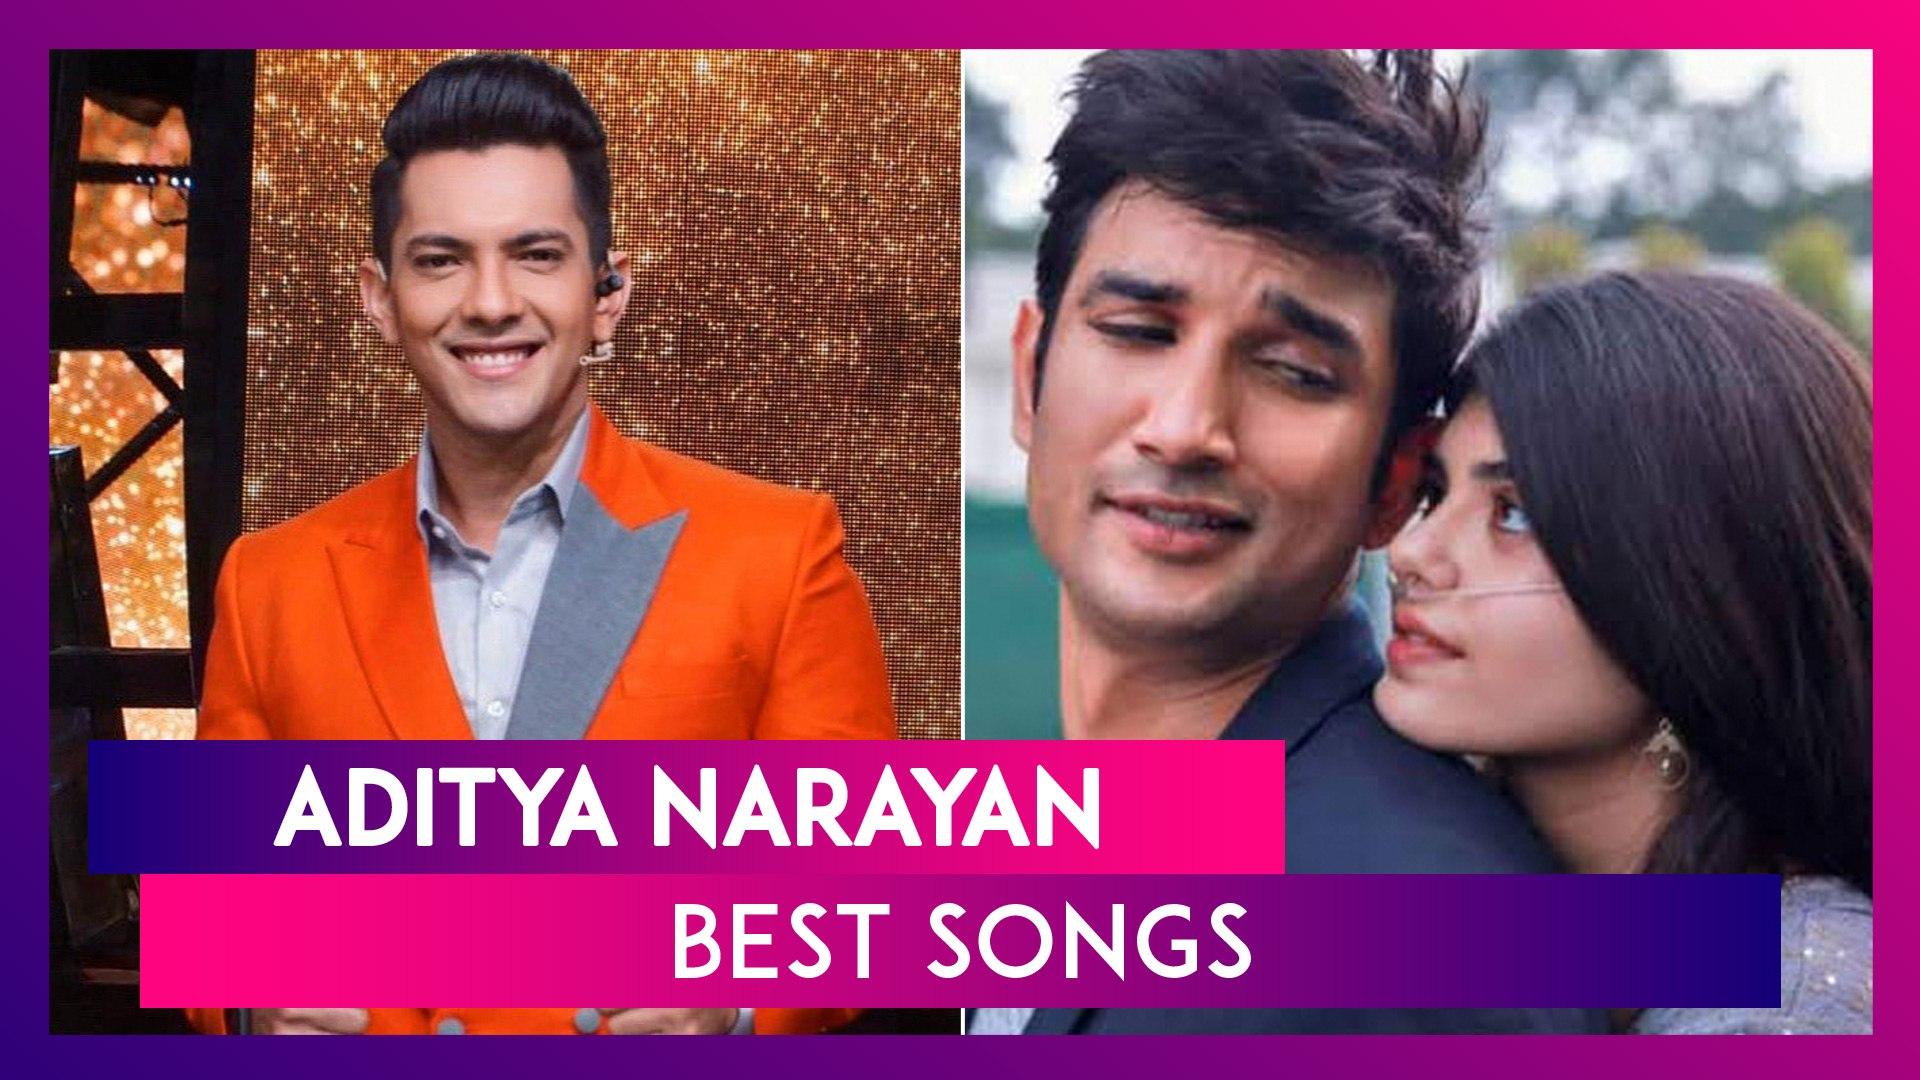 Aditya Narayan Birthday 7 Songs That Speak For His Versatility As An Artist Video Dailymotion